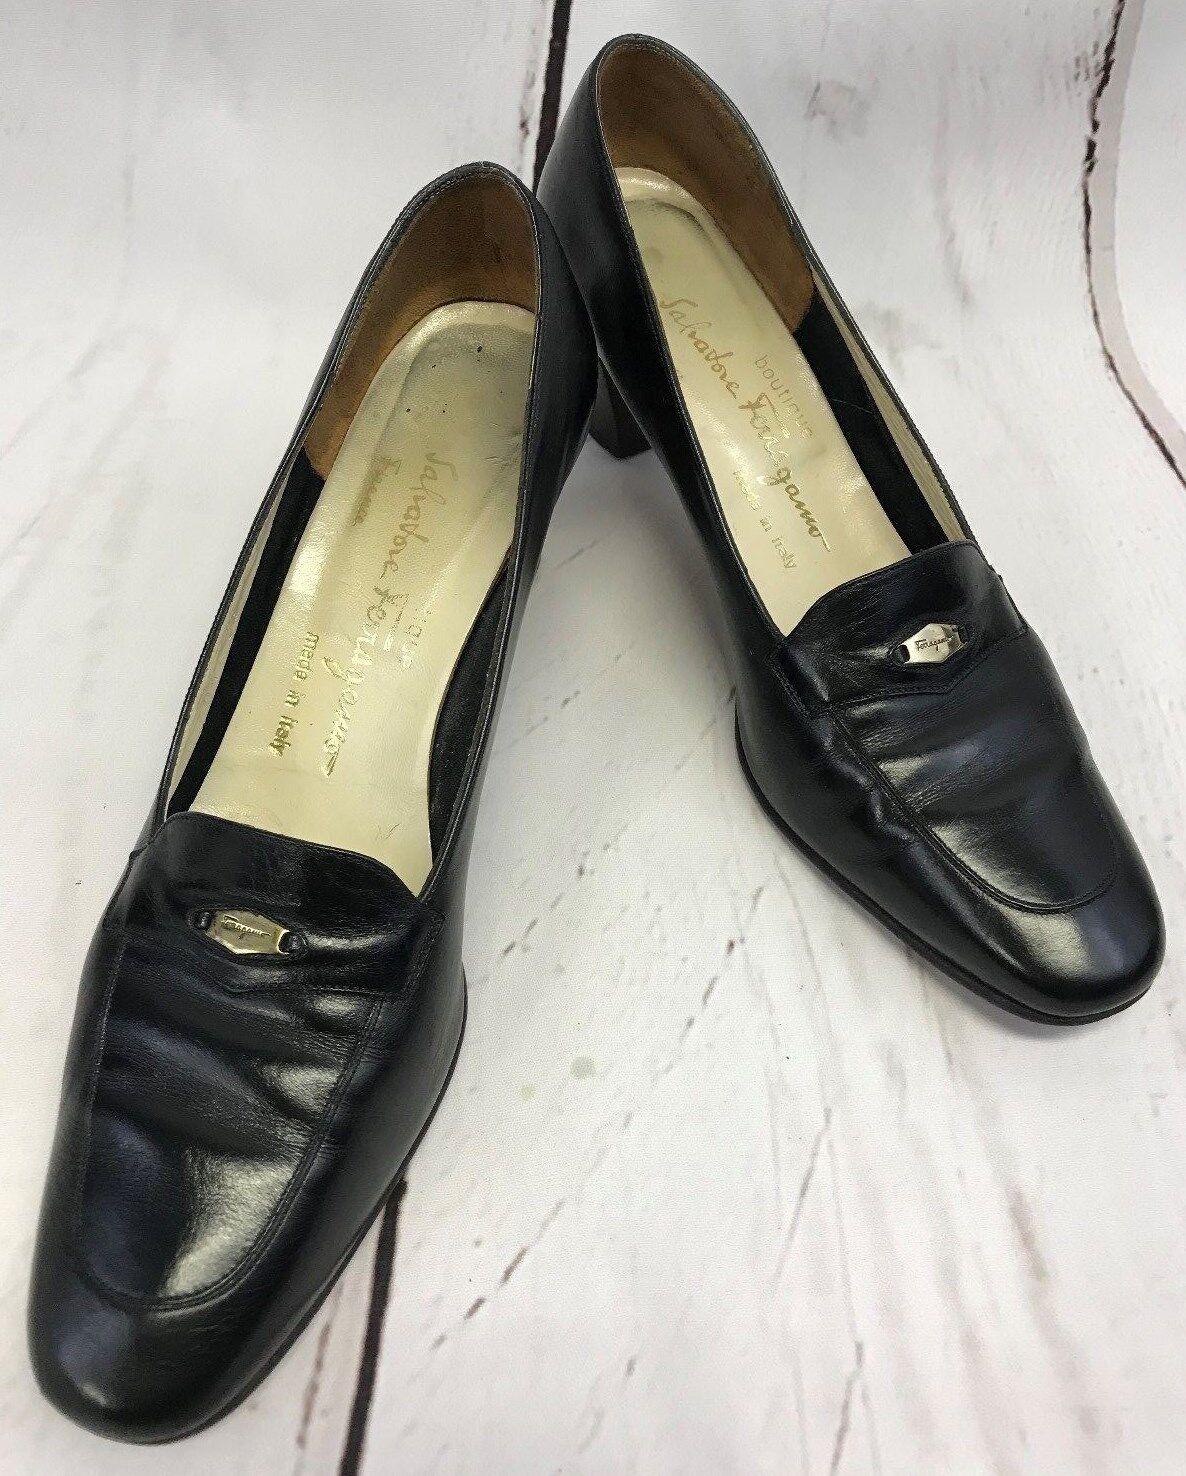 Salvatore Ferragamo Black Leather Heel  Pumps gold Logo Size 9 AAAA